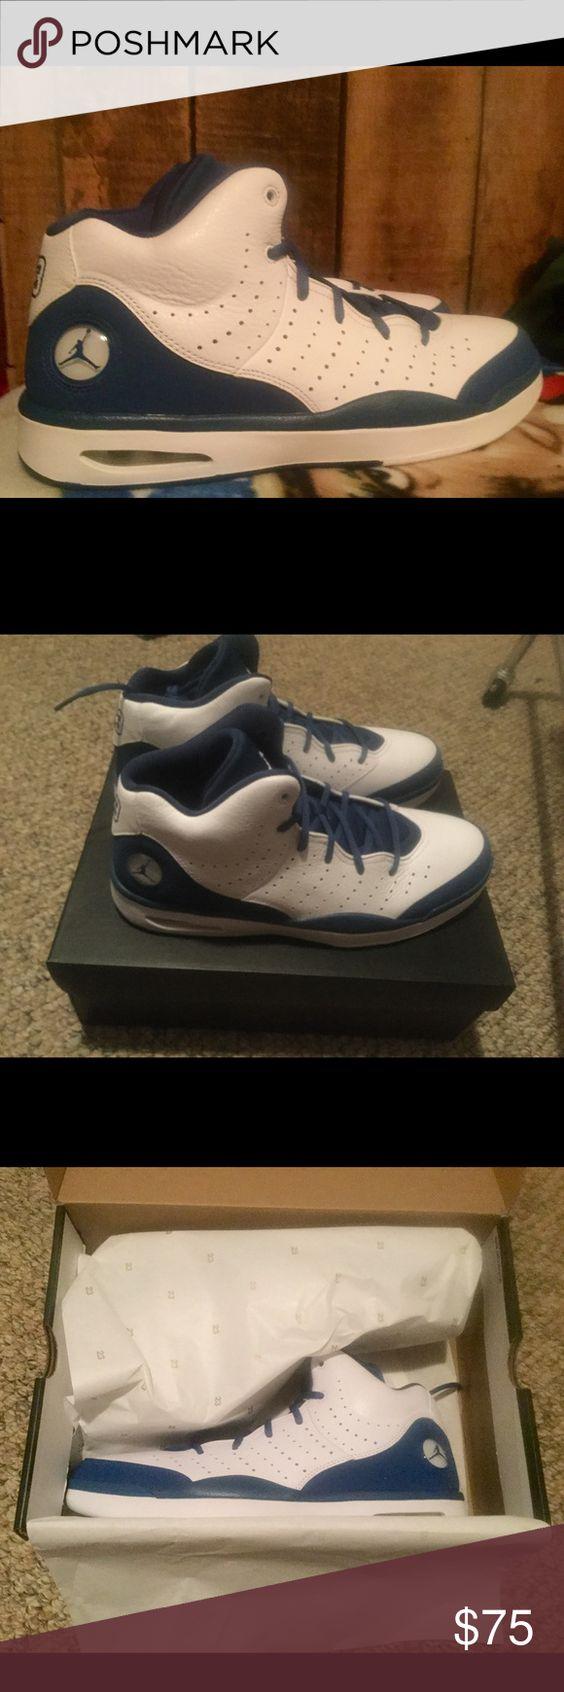 NWT authentic Men's size 12 Jordan Flight shoes Brand new, still in original packaging authentic Jordan Flight shoes. Men's size 12, colors French Blue/White Jordan Shoes Athletic Shoes